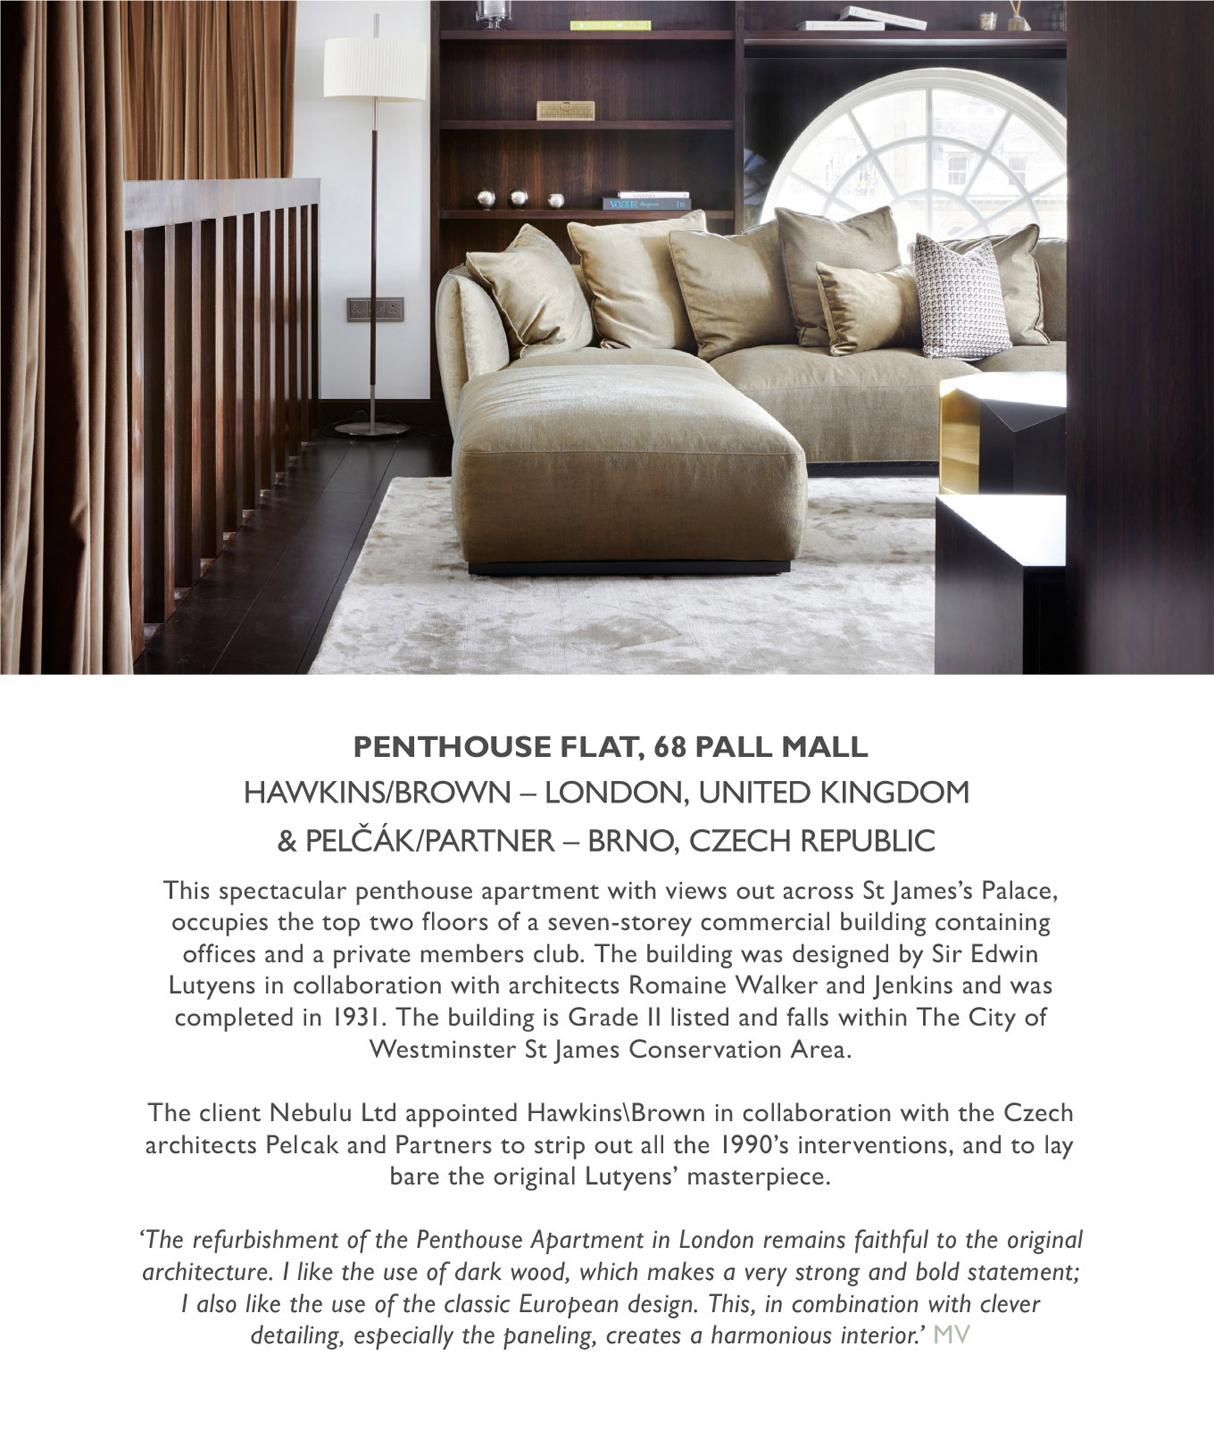 Finalista World Interior News Awards 2016, vkategorii Residential Interiors68 Pall Mall Penthouse, Londýn, Velká Británie